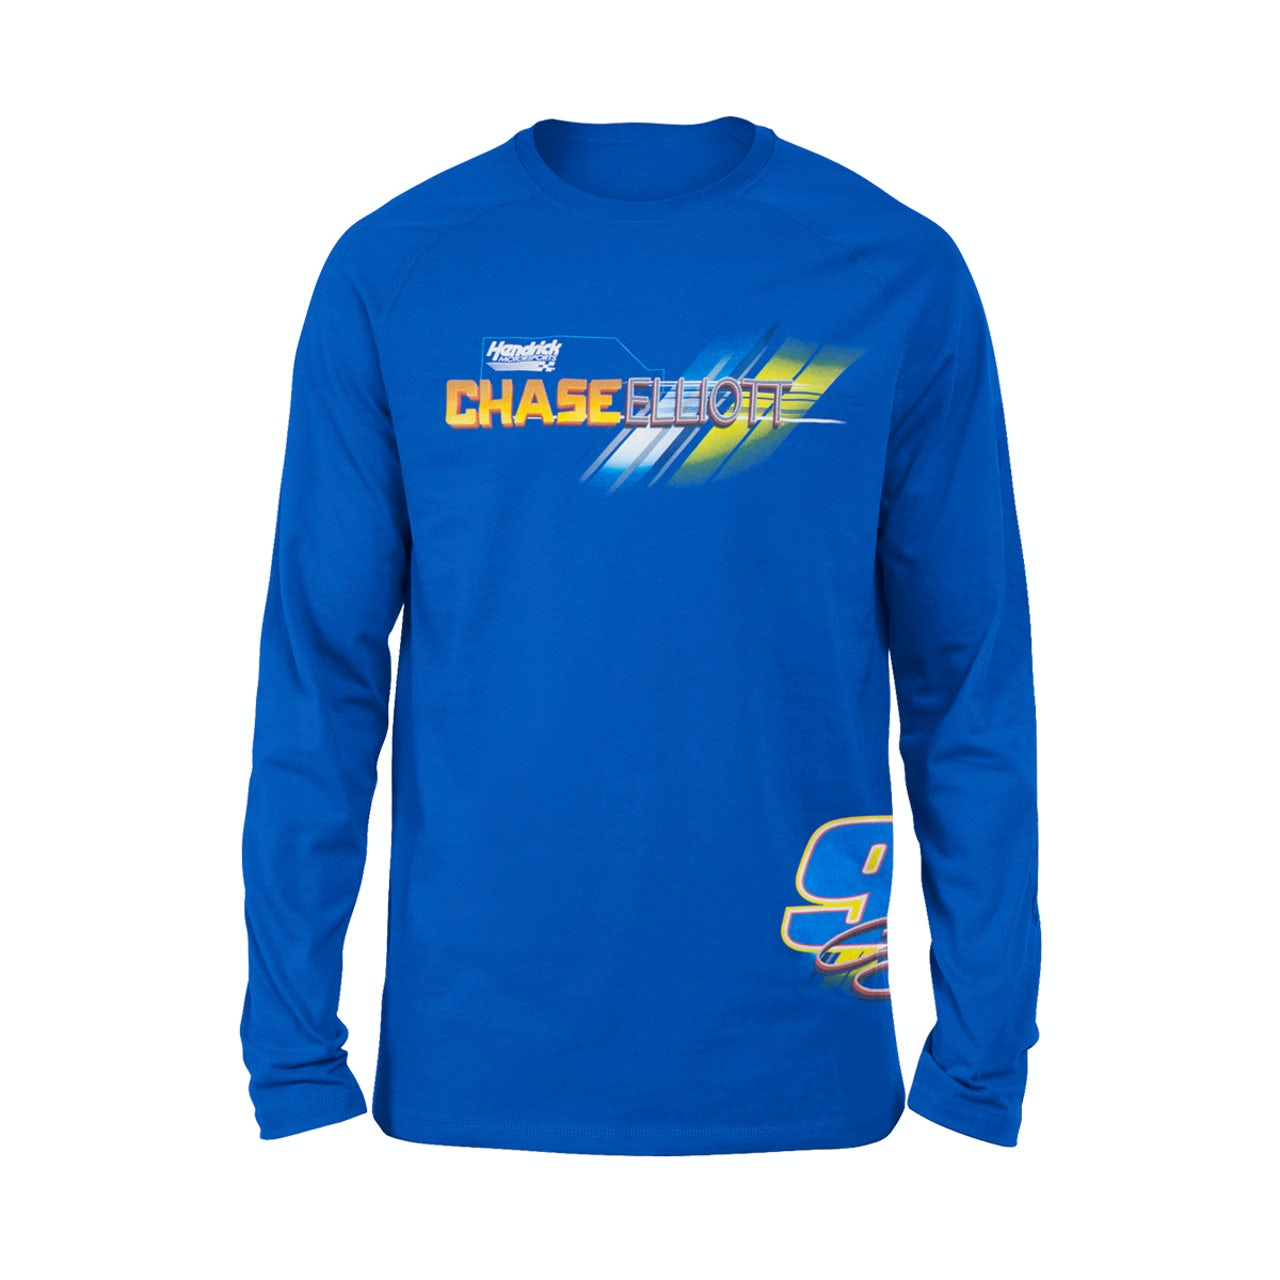 Hendrick Motorsports Chase Elliott #9 Full Throttle LS T-shirt